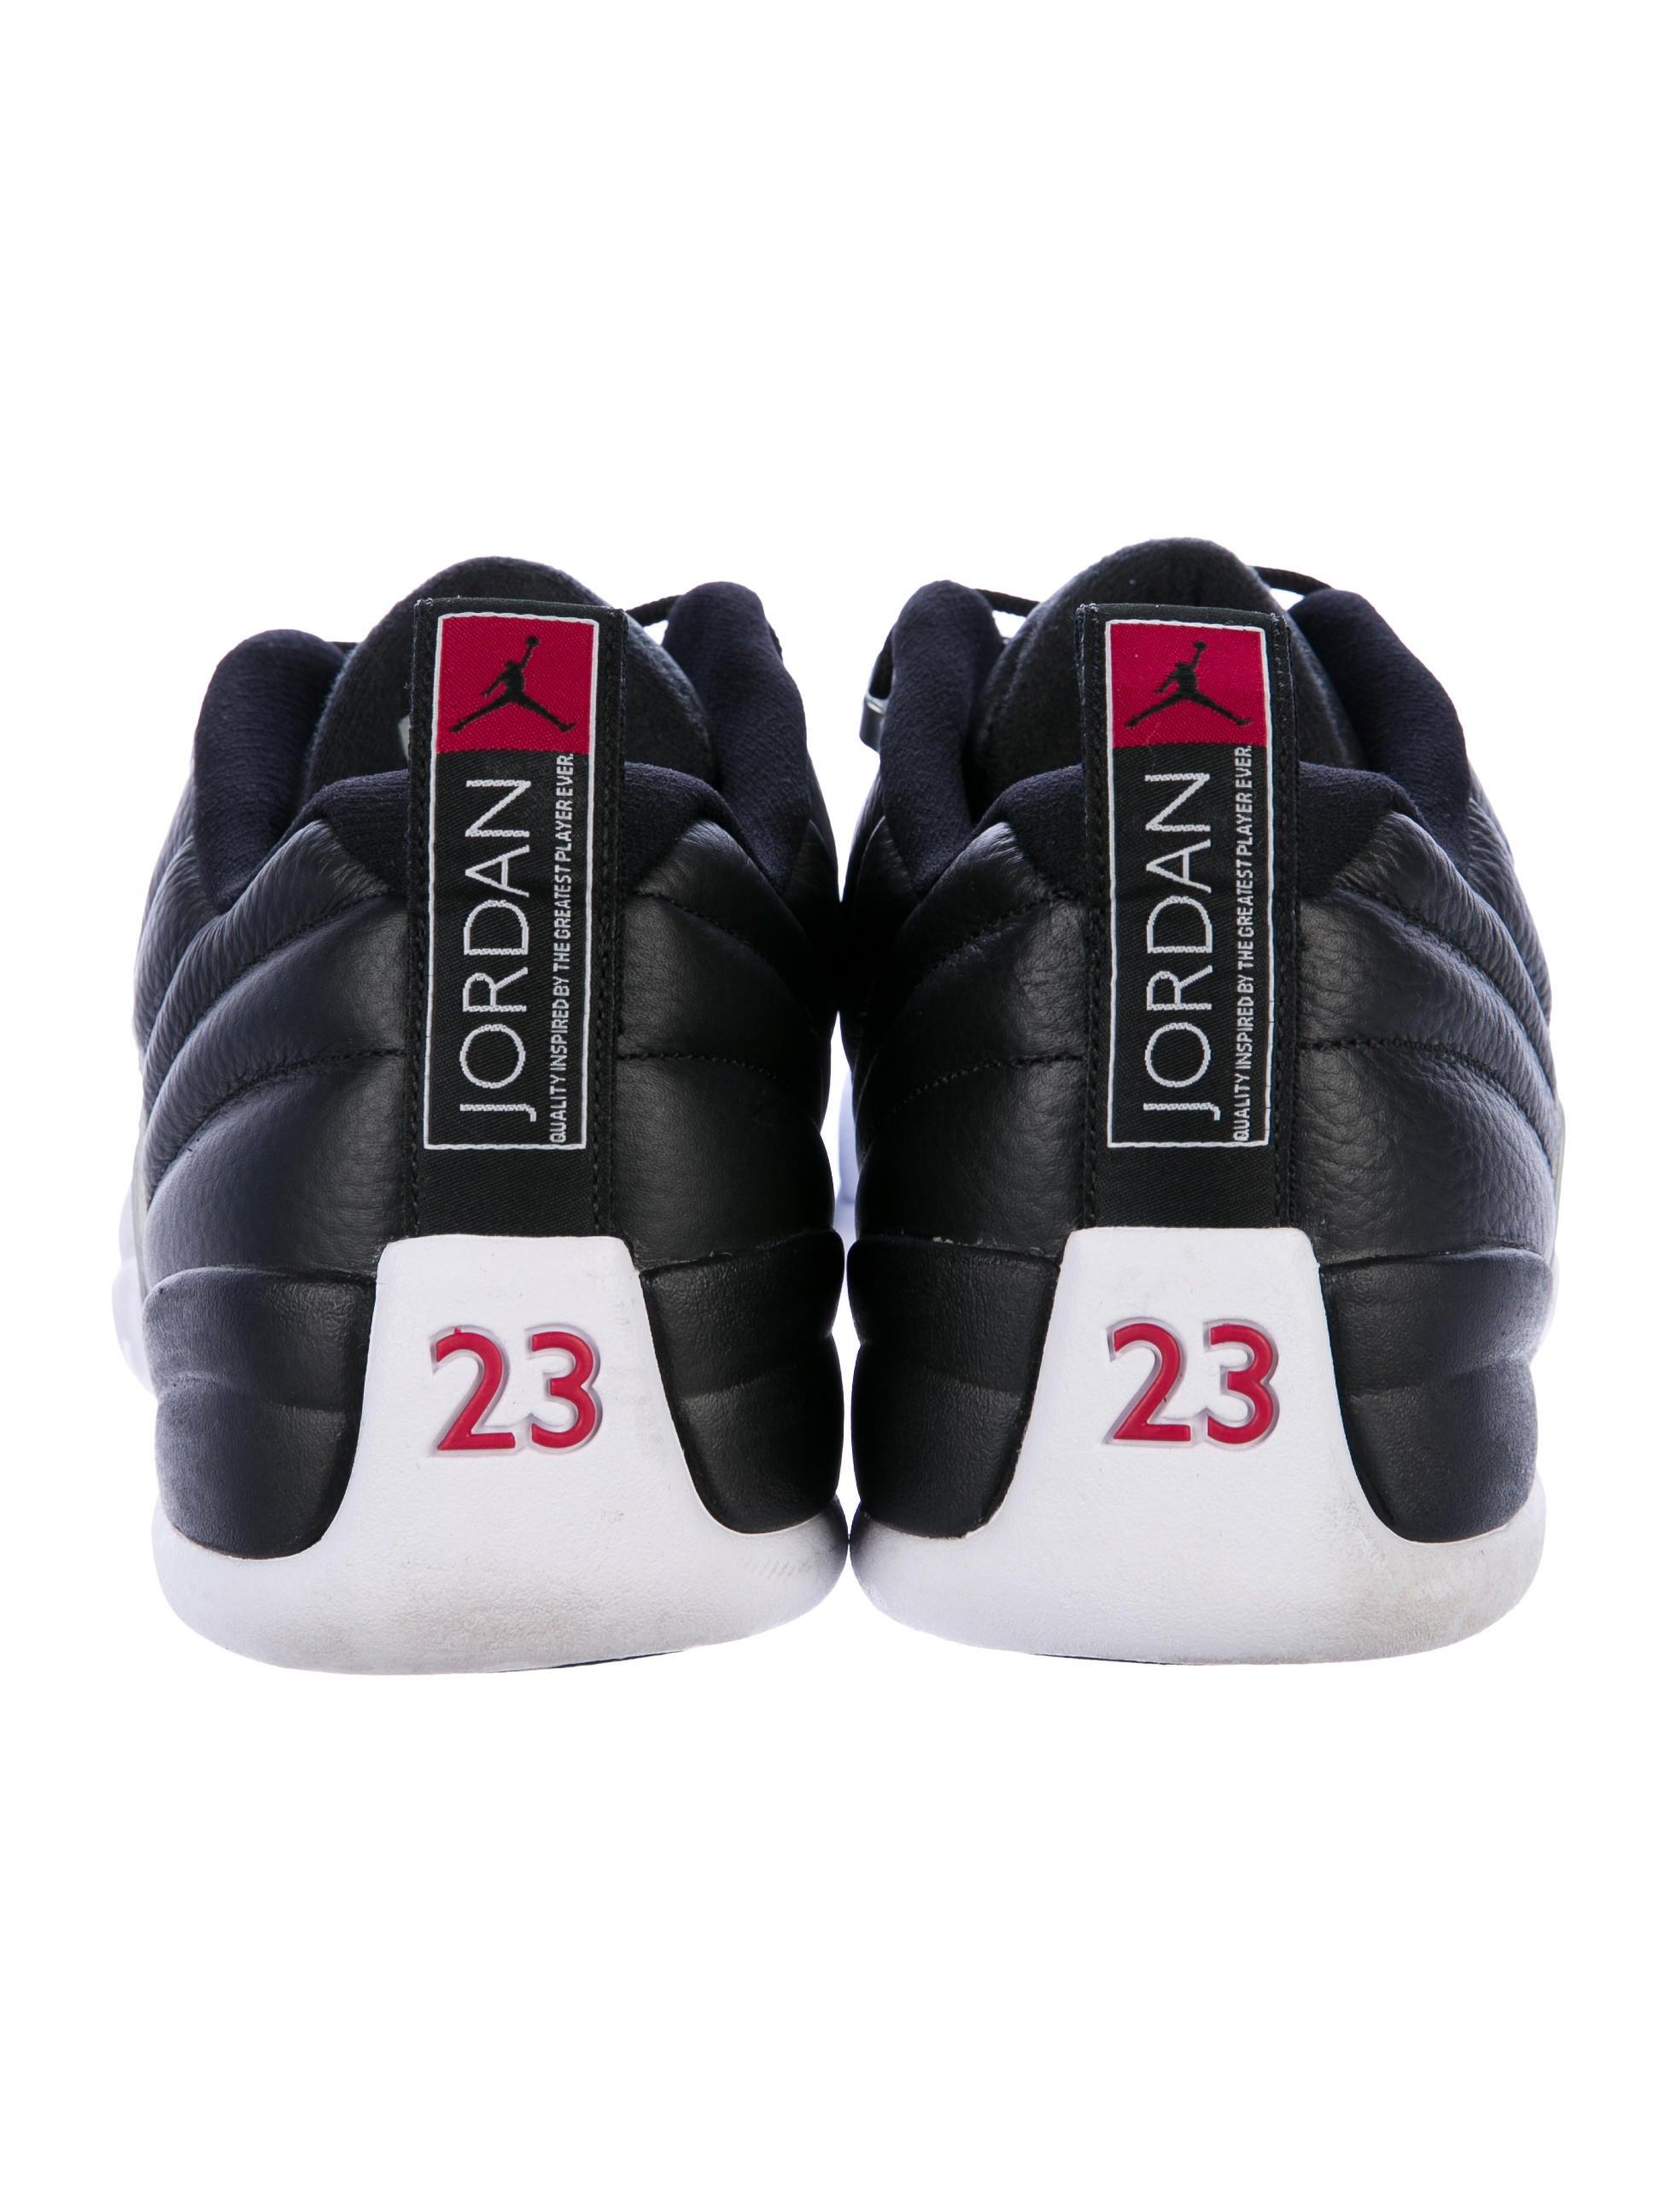 Nike Air Jordan 2016 12 Retro Sneakers Shoes Wniaj20410 The Realreal